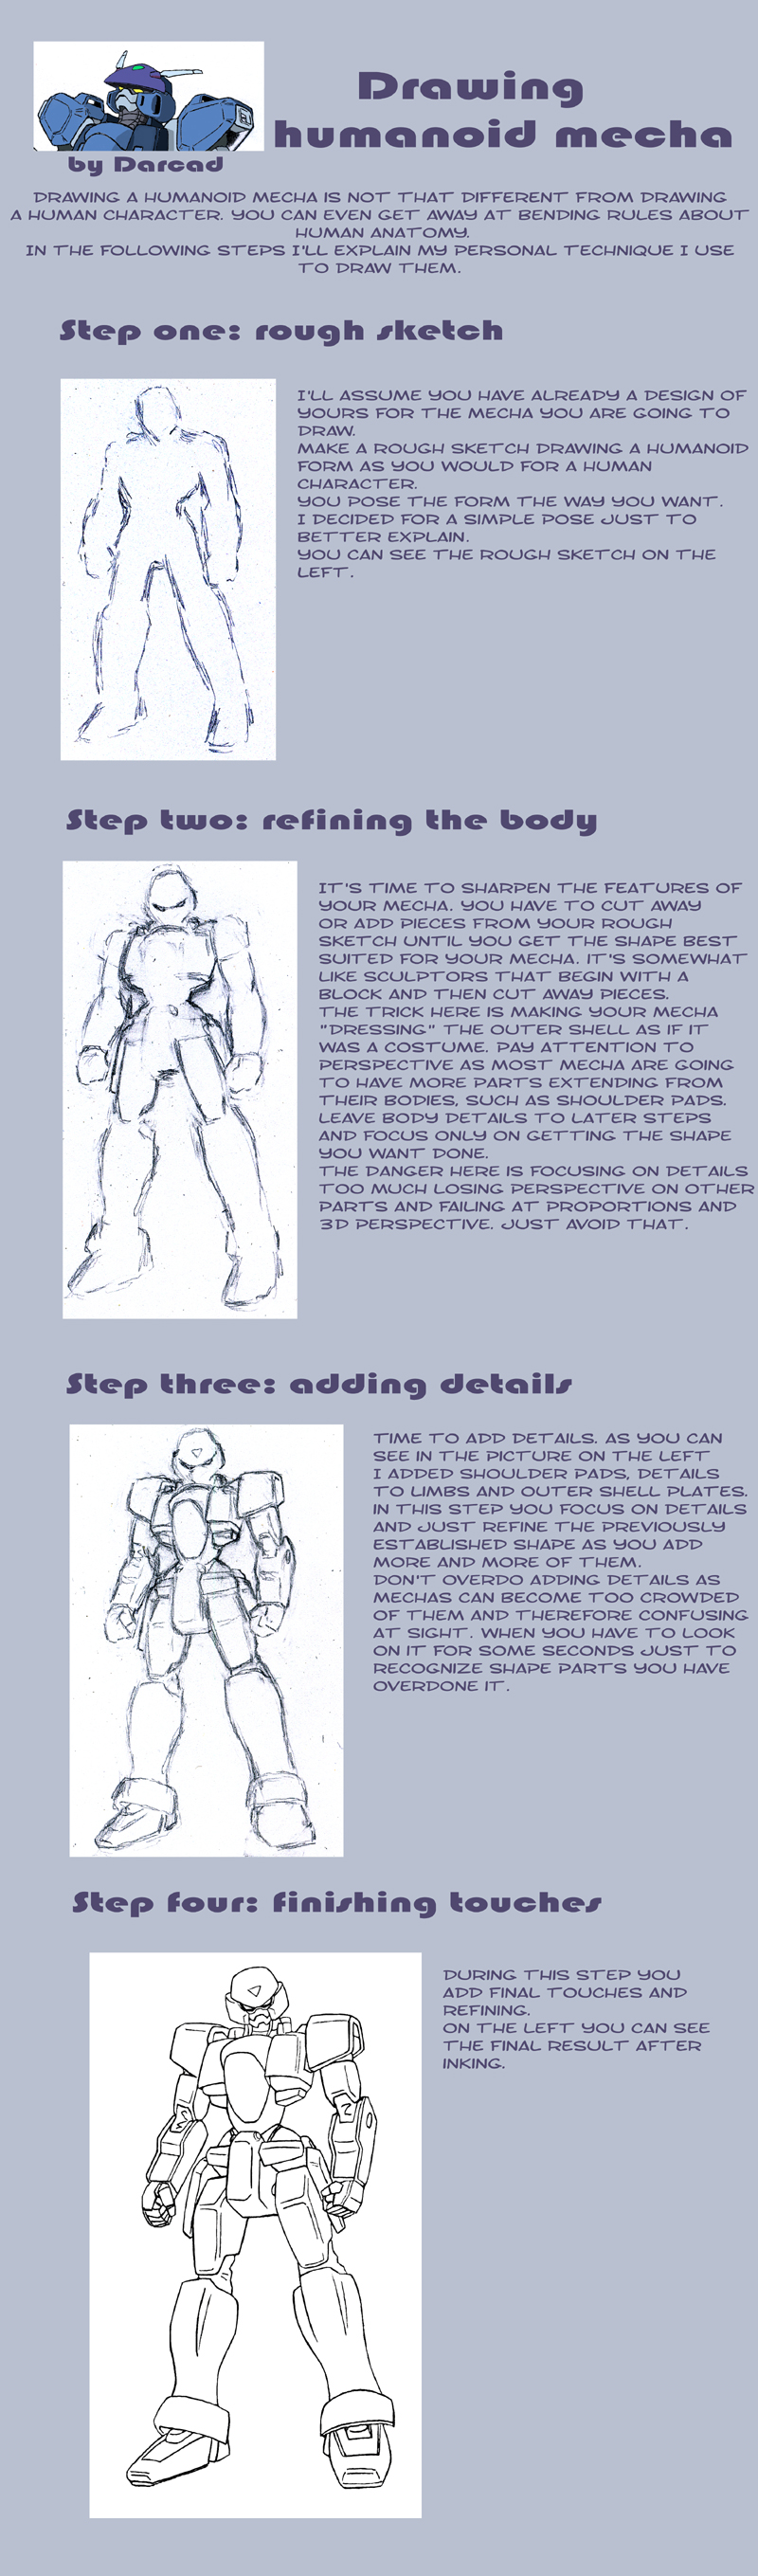 Tutorial: draw humanoid mecha by Darcad